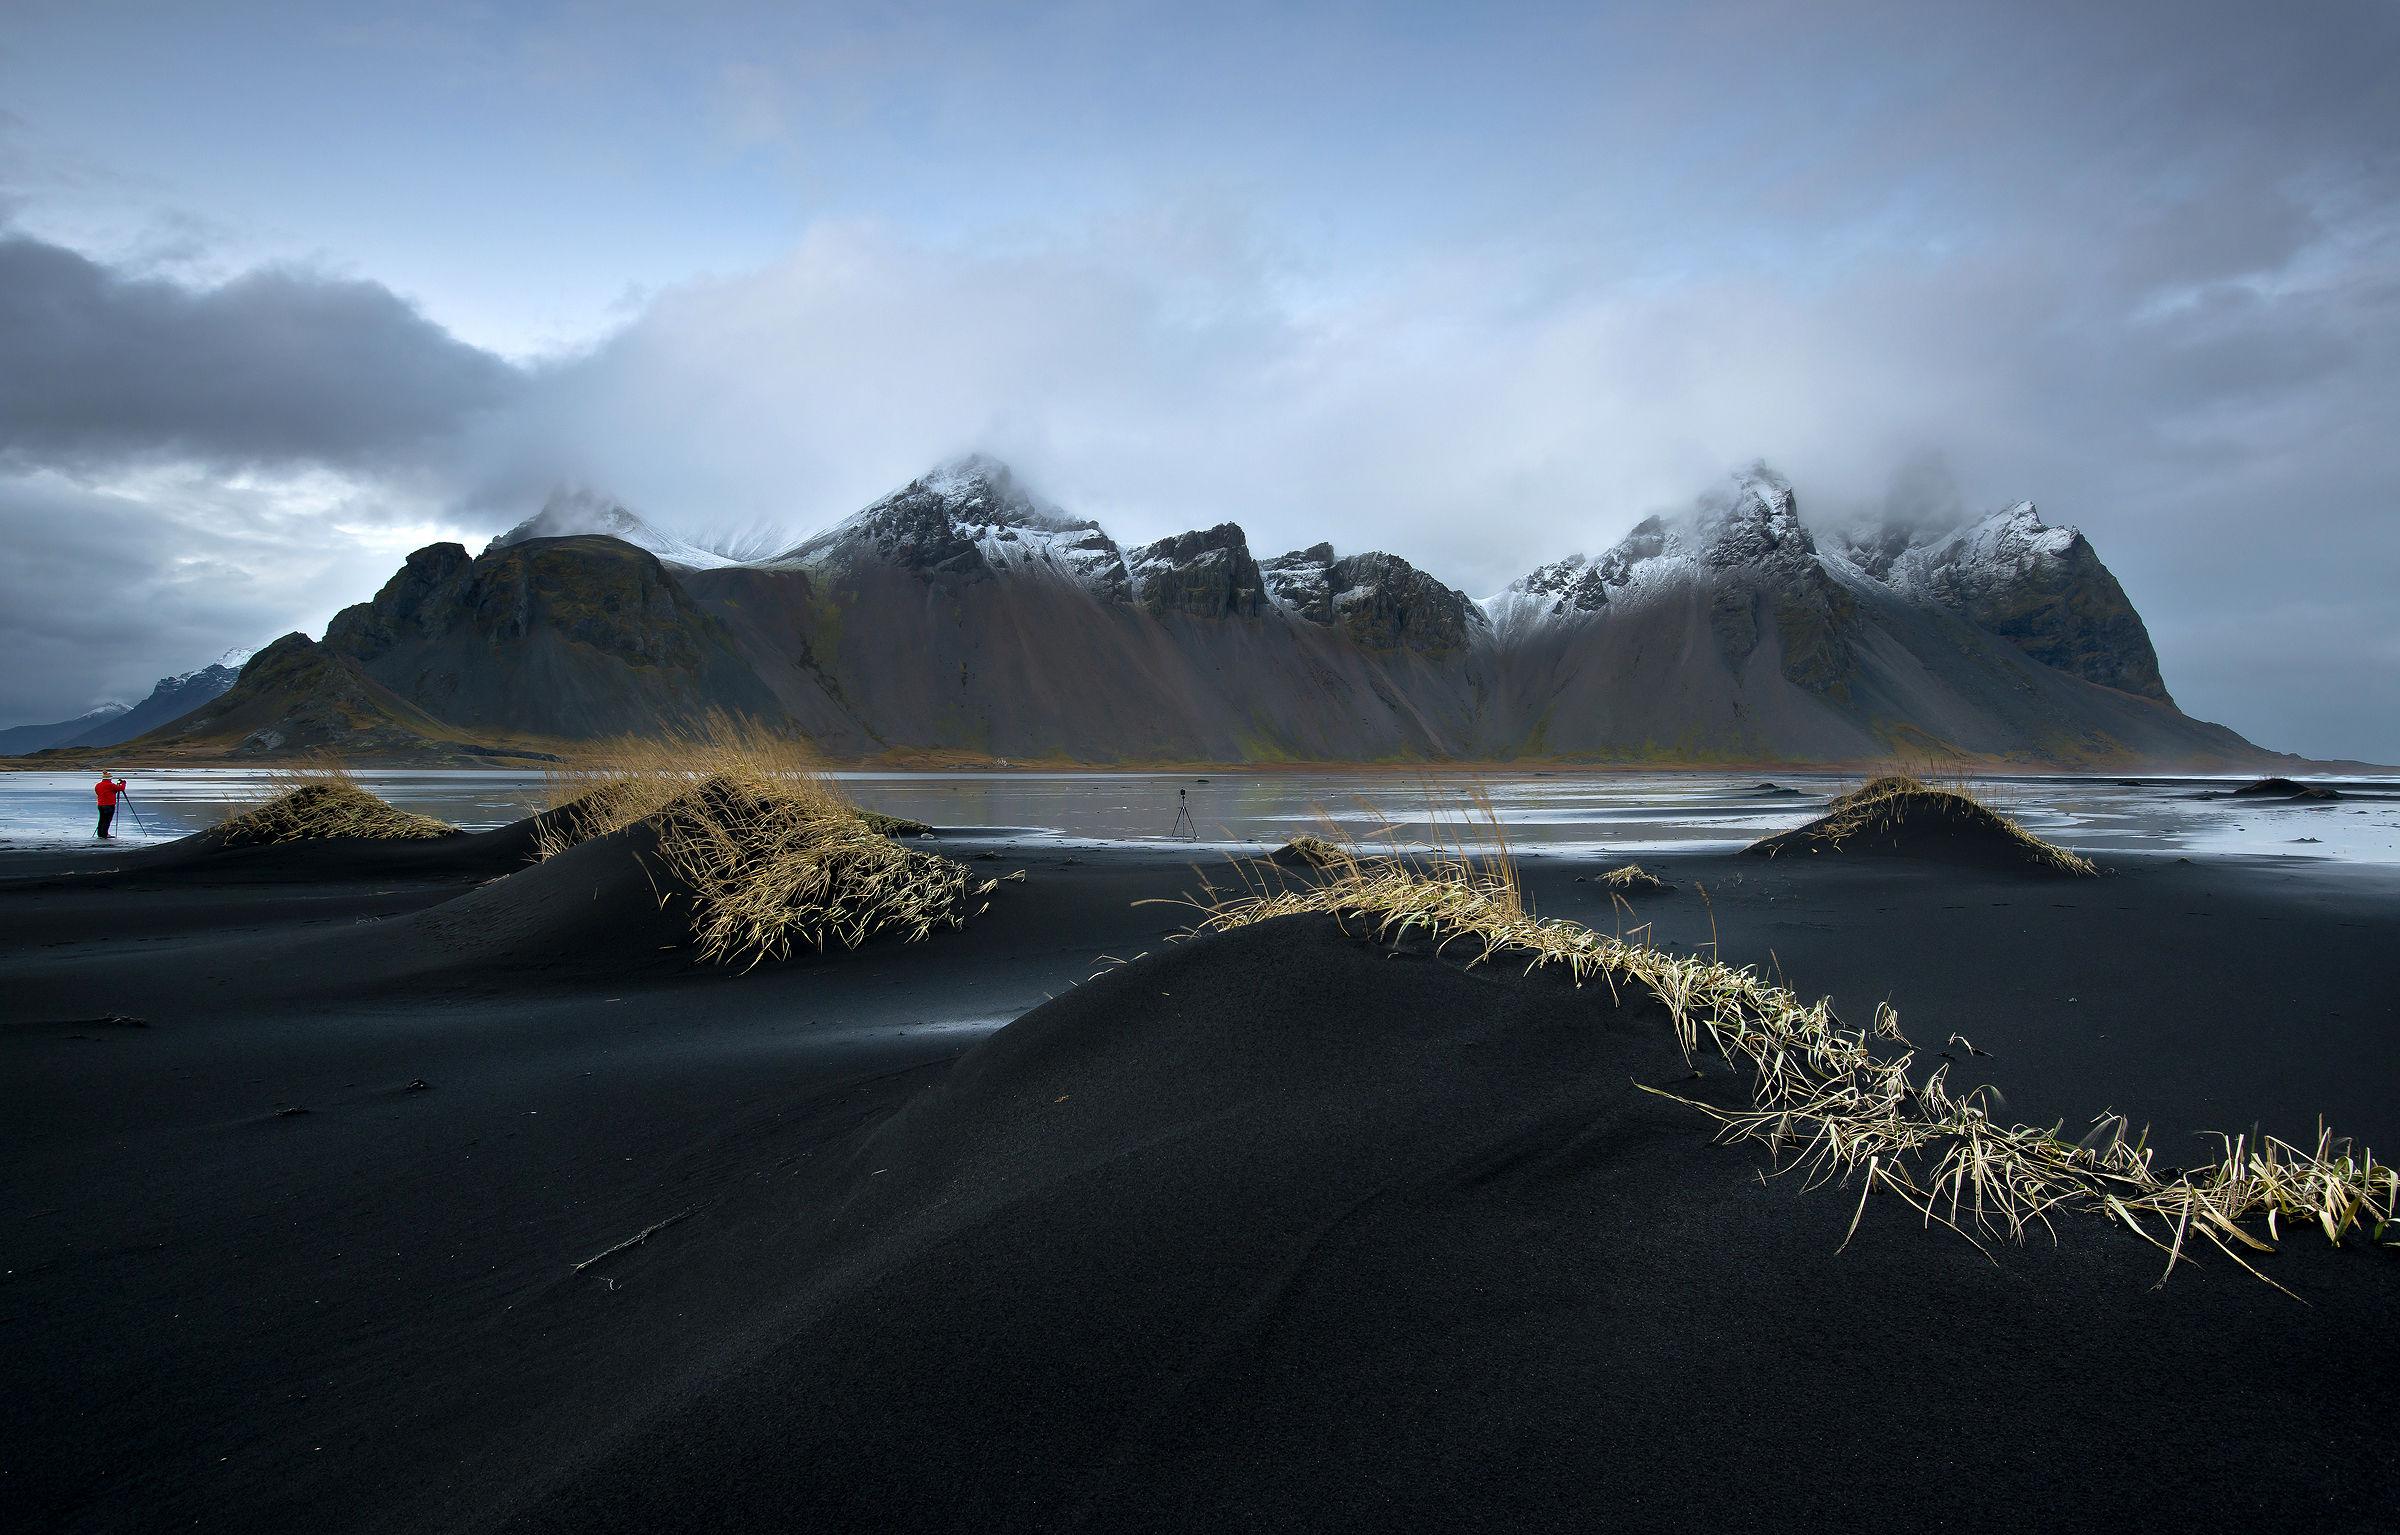 Iceland - Vestrahorn 2.0...